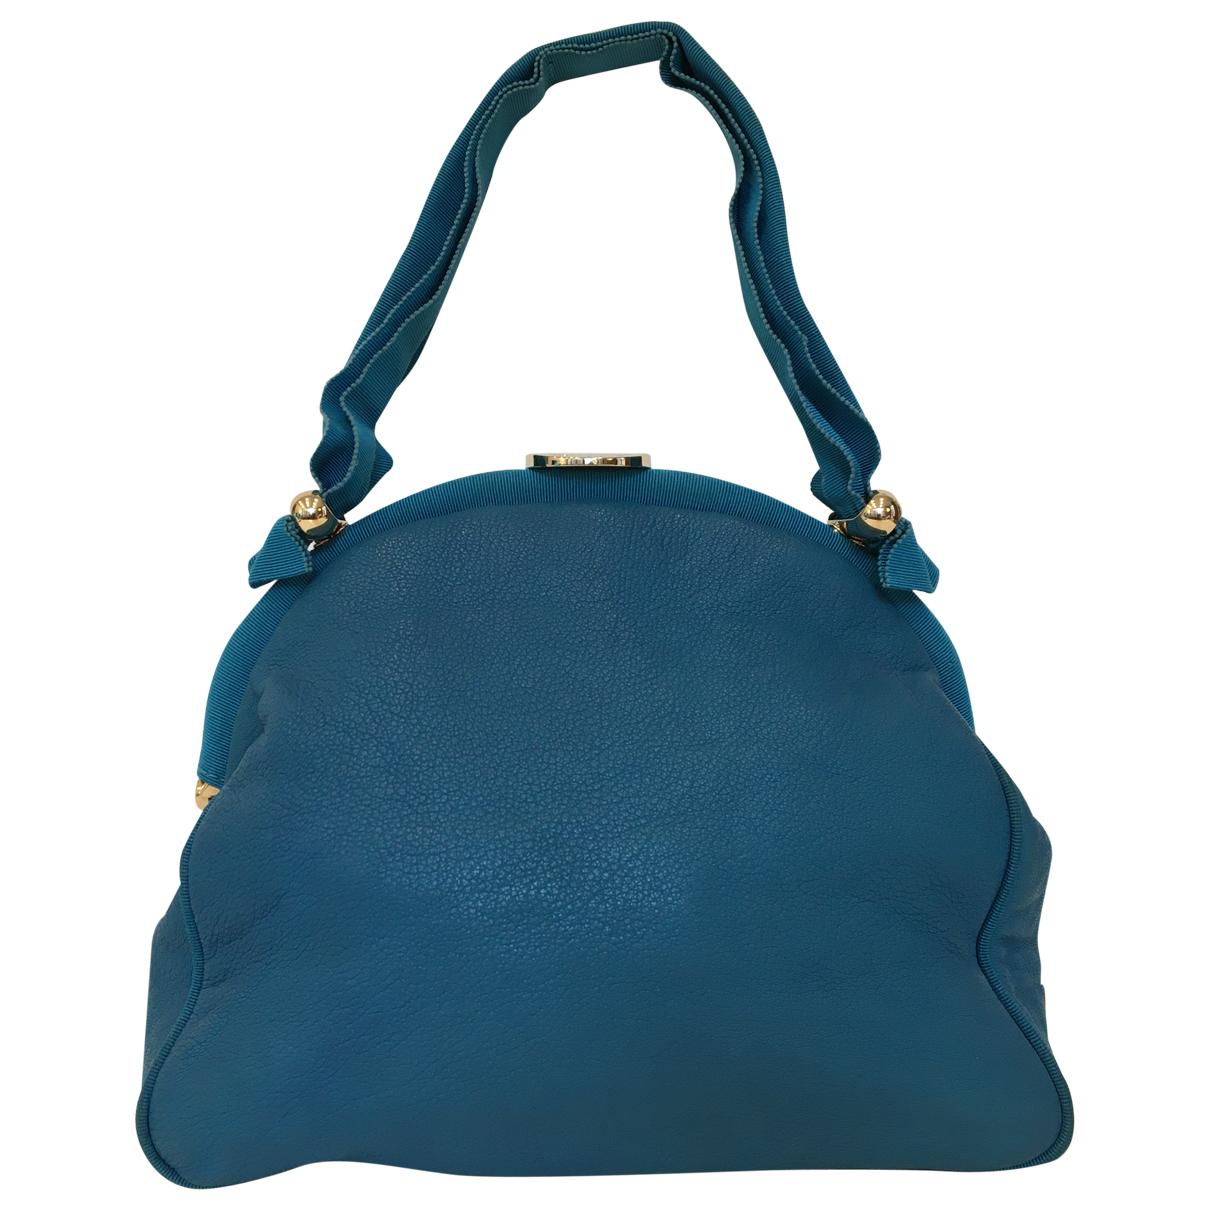 Emporio Armani - Sac a main   pour femme en cuir - bleu